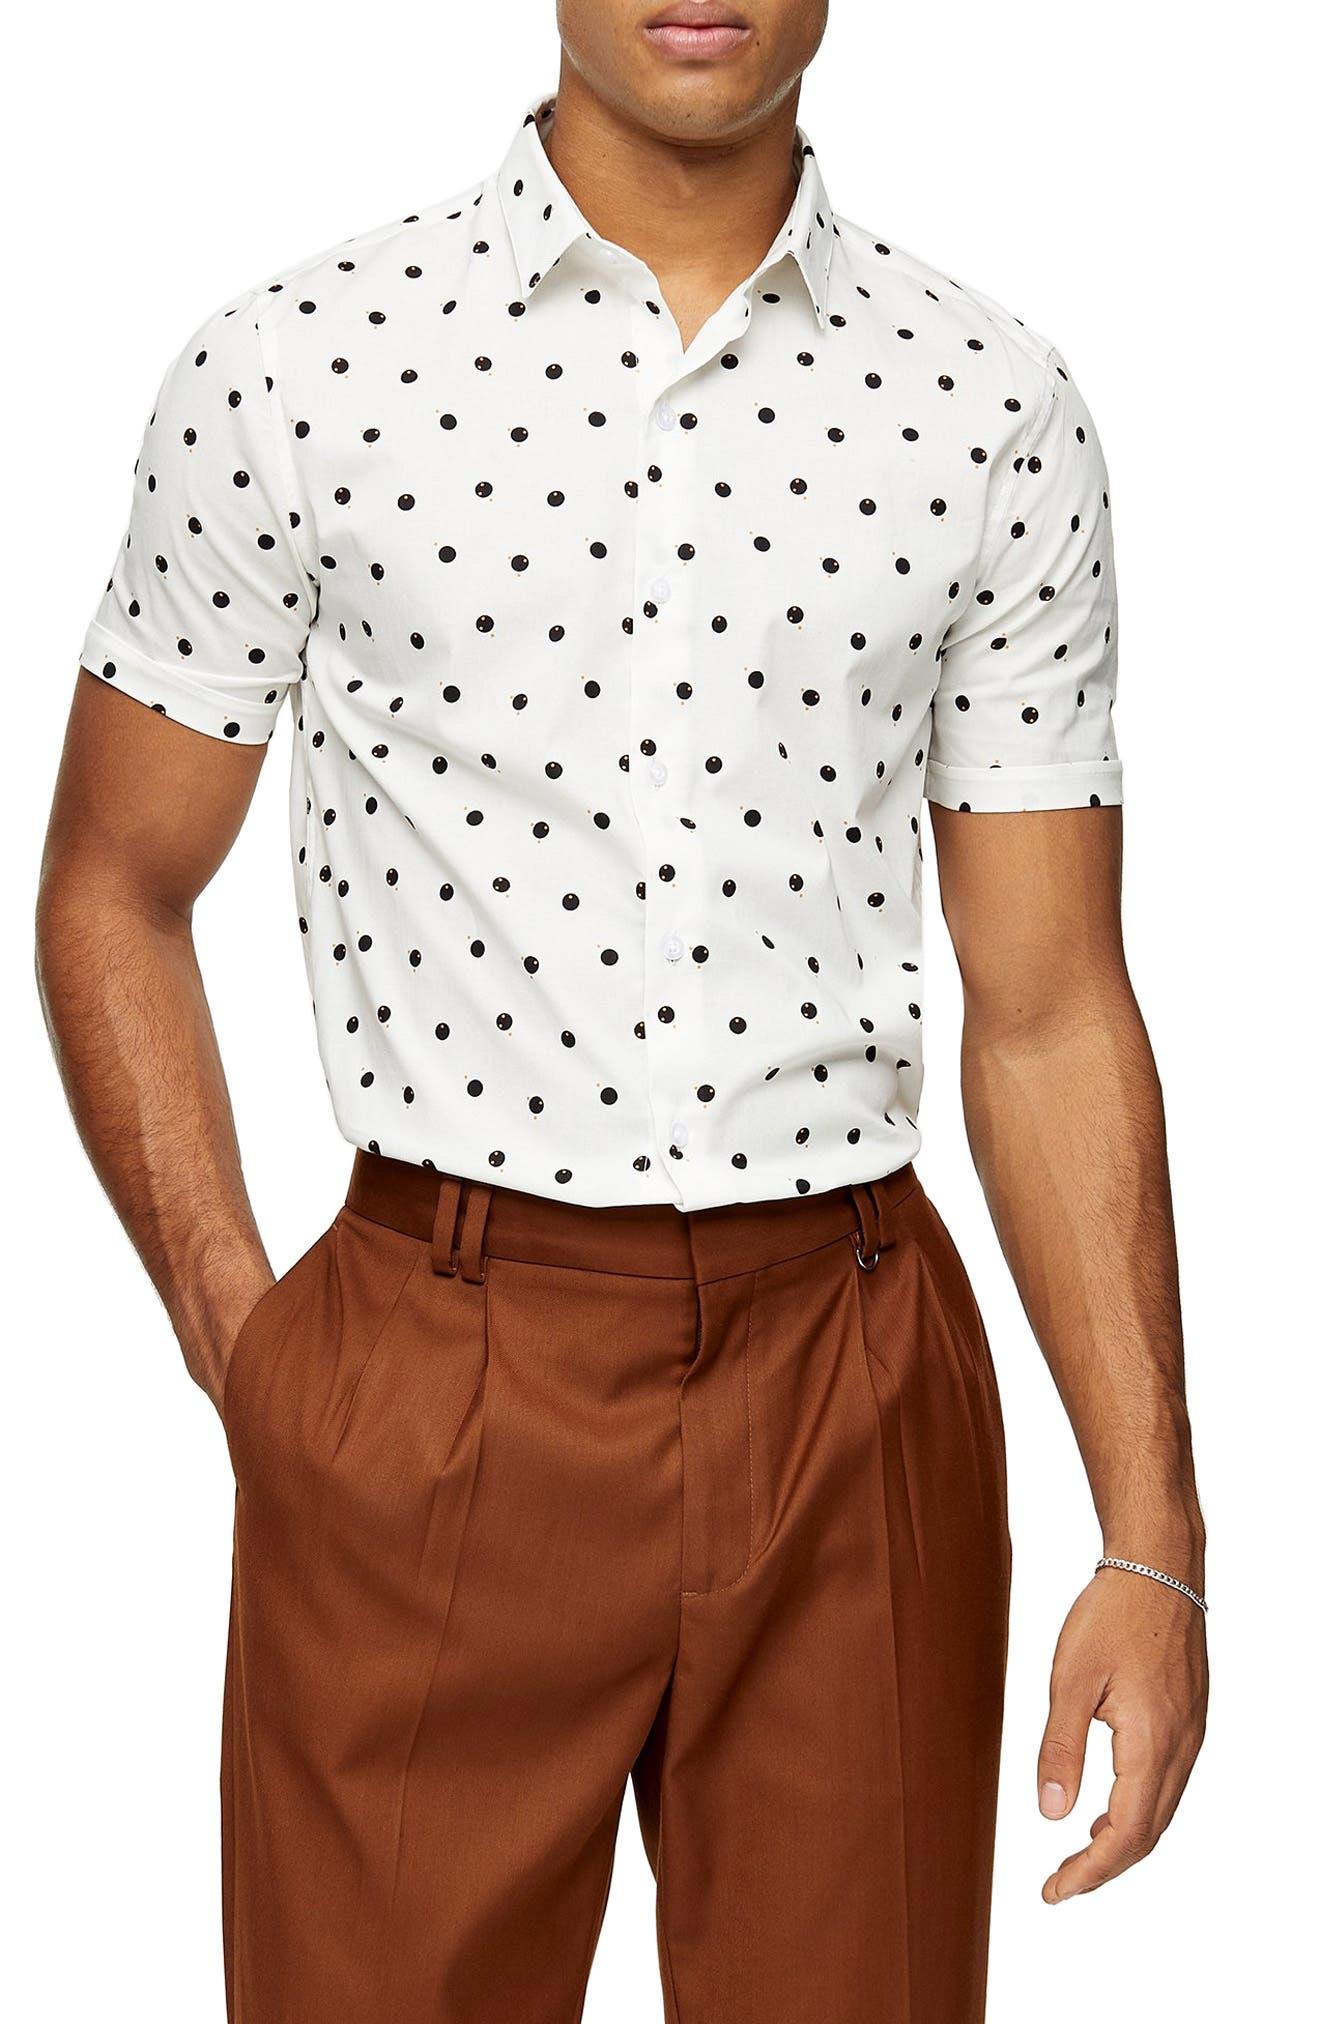 Chubbies Mens Size Large Beige Short Sleeve Casual Button Front Shirt Paint Dot